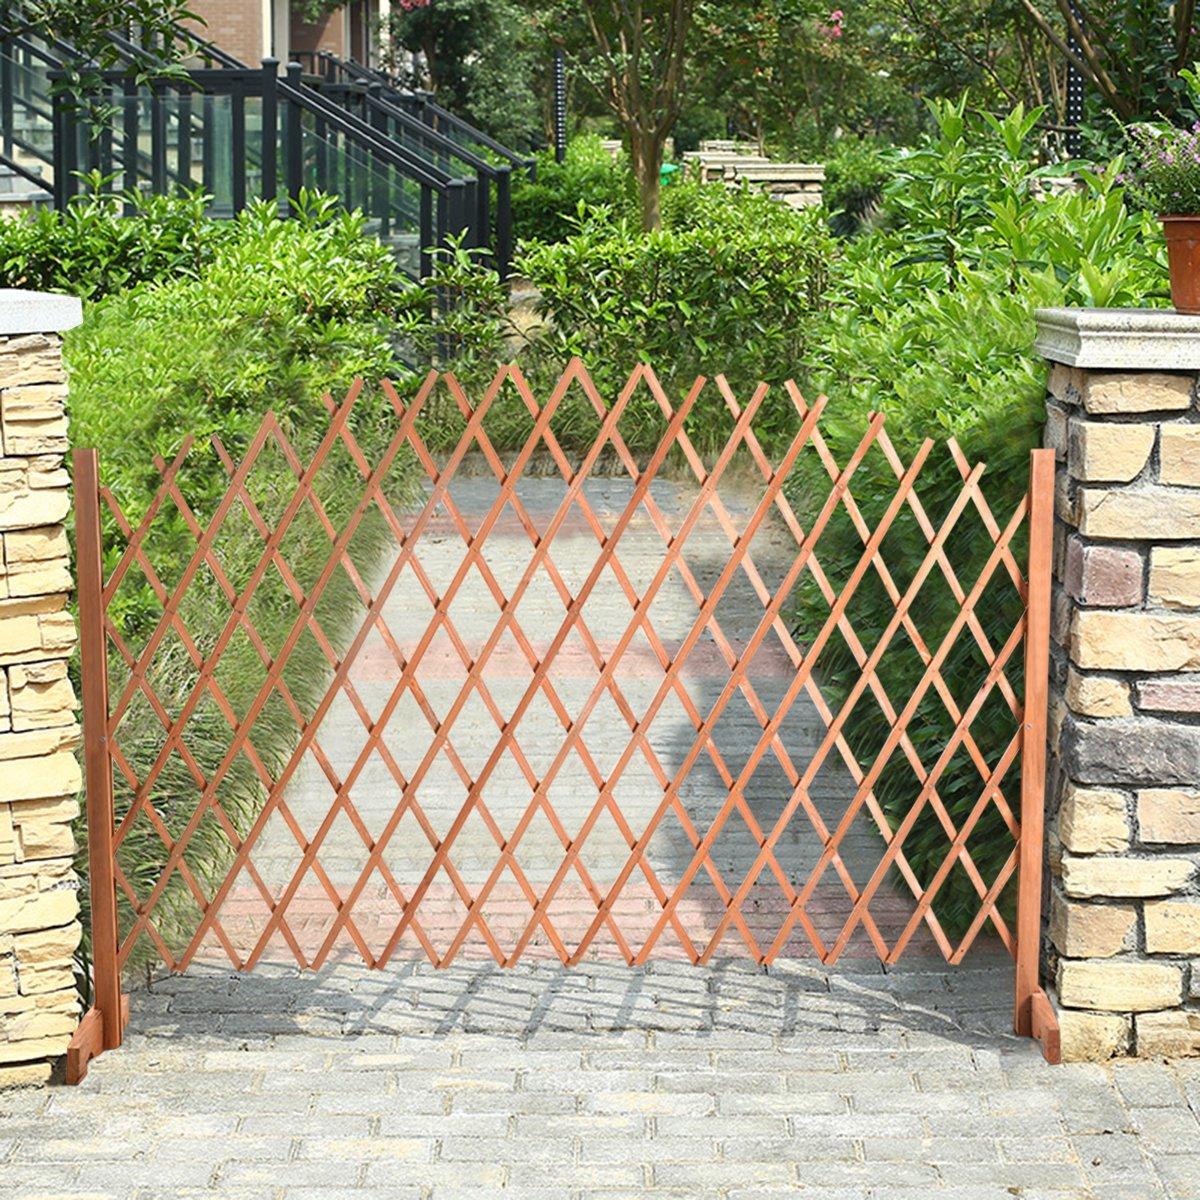 Costway Expanding Trellis Wood Fence - Growing Support 1.80 m x 1.18 m Garden Screen Divider - Adjustable Growing Wooden Freestanding … (1.80)